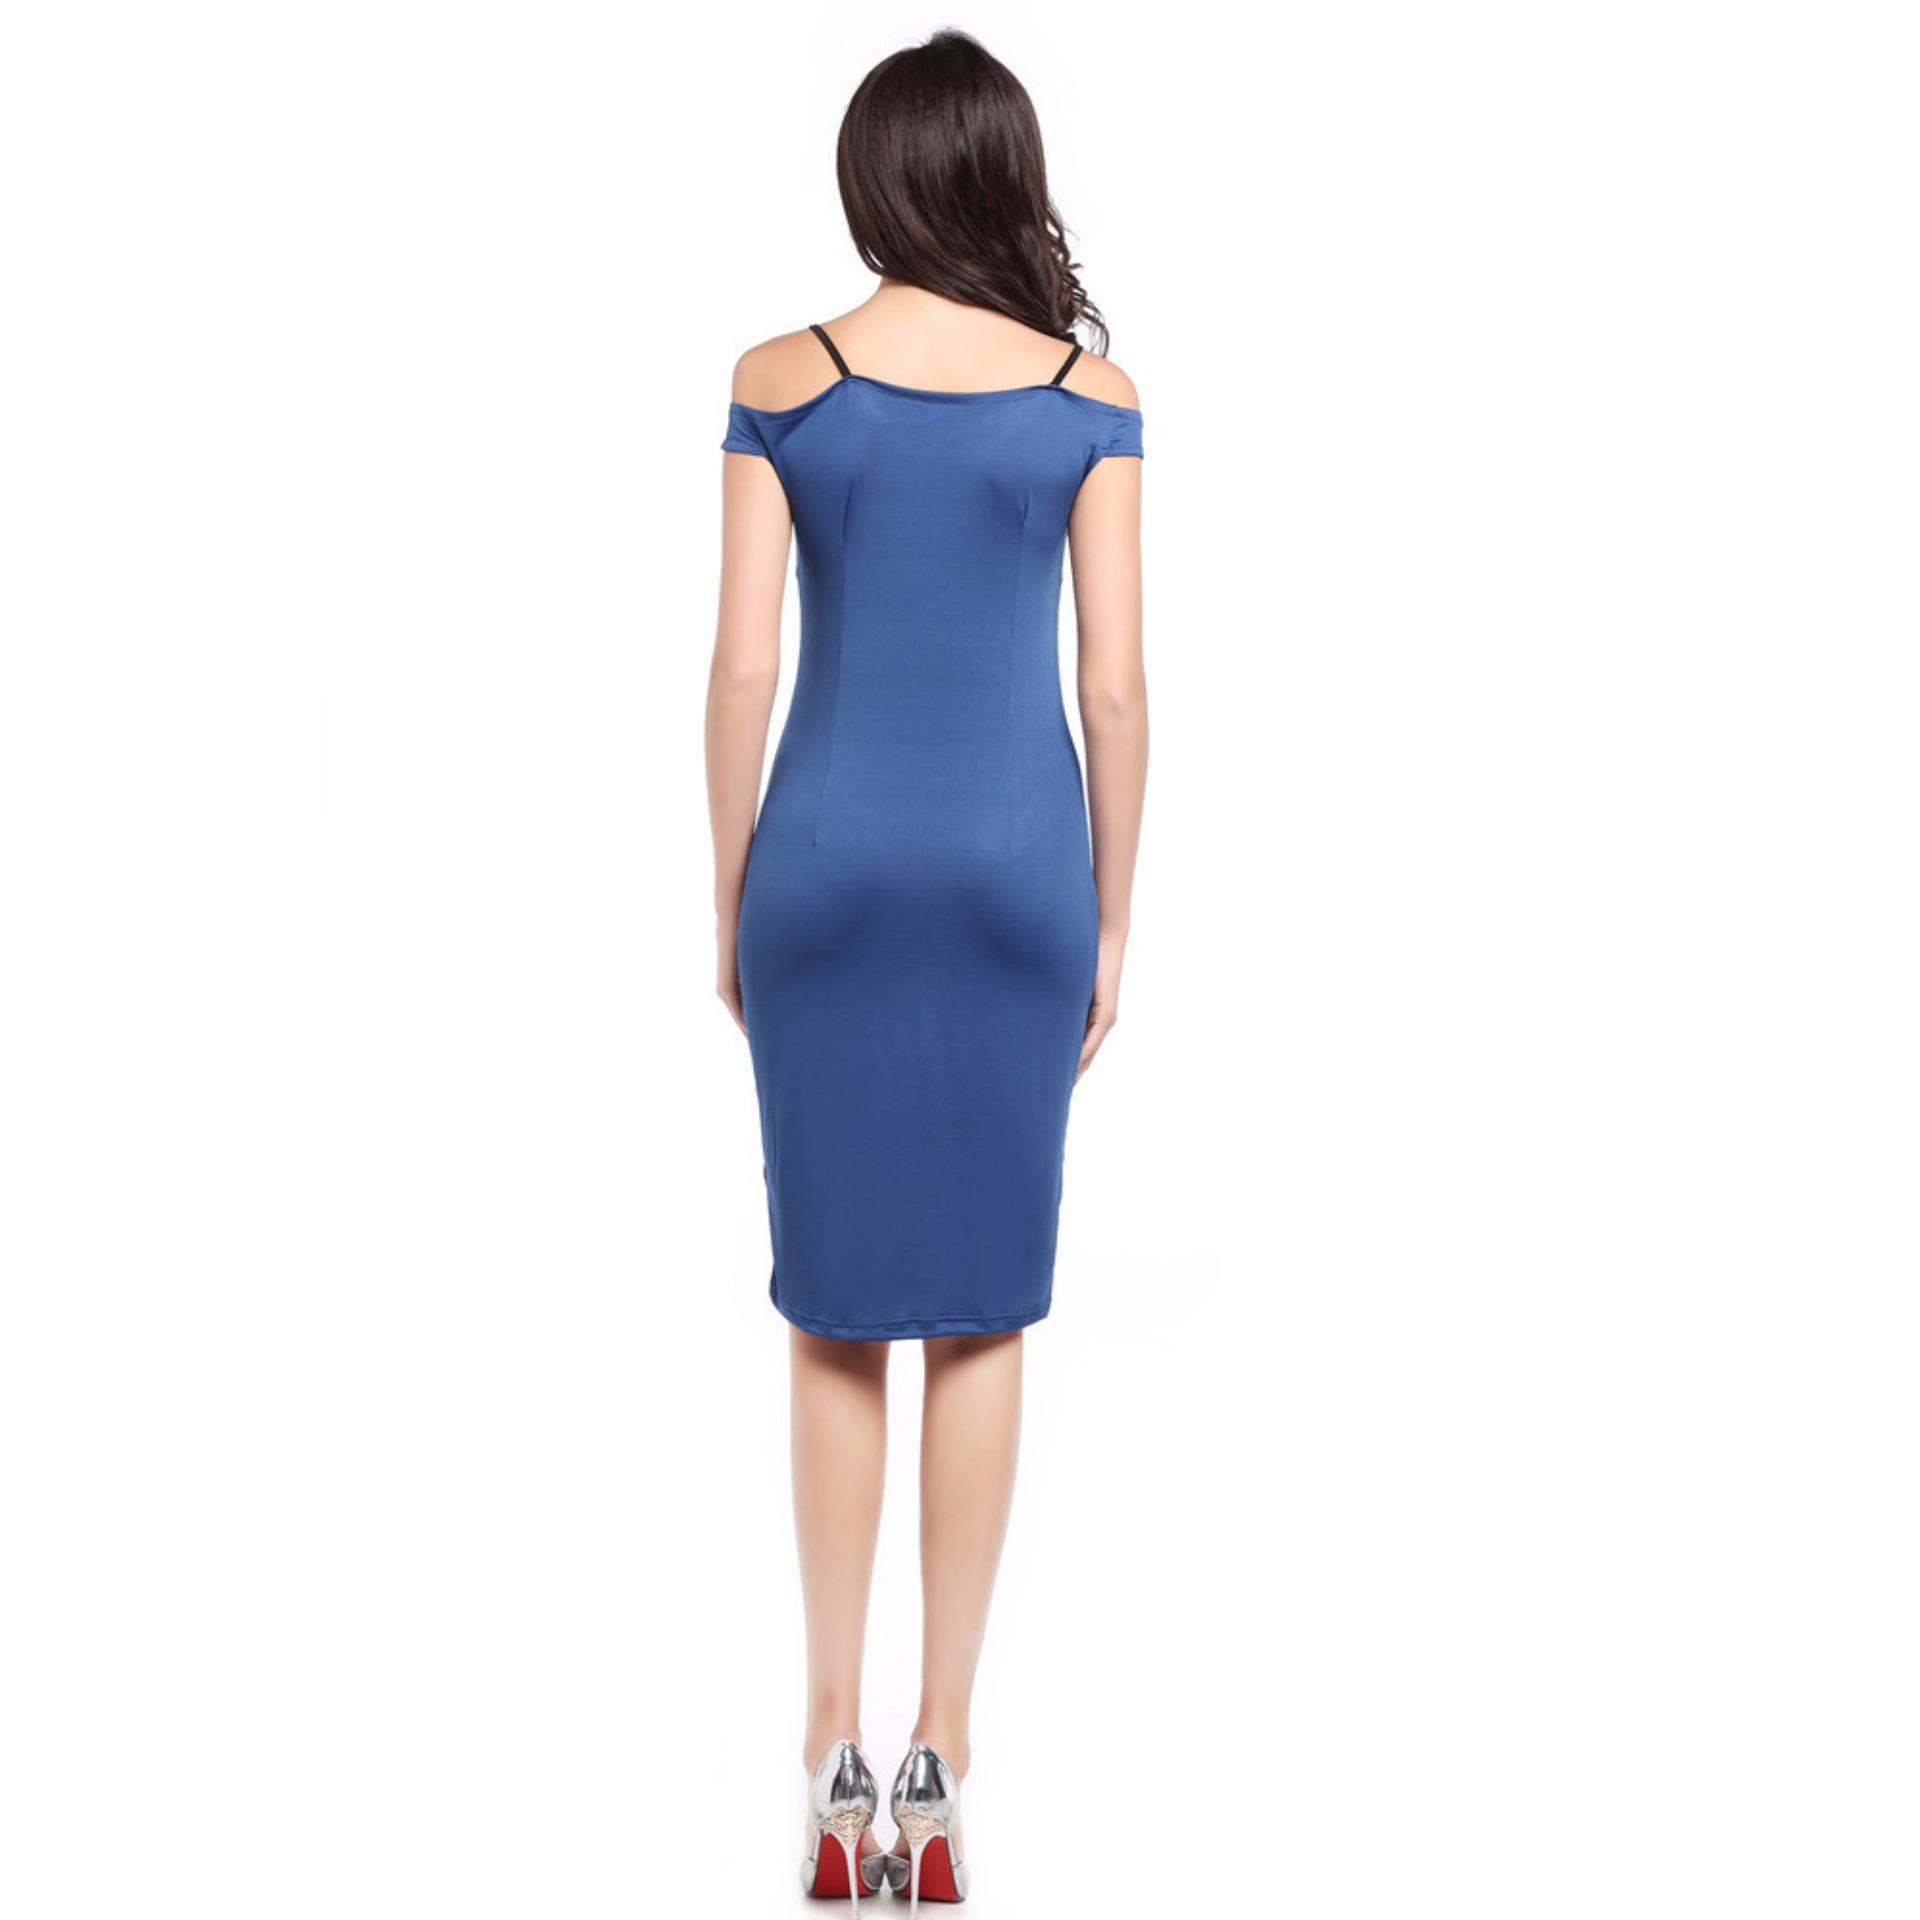 Sandal Hak Blok Musim Panas Wanita Fesyen Sepatu Platfom Tinggi Tumit.  Source · Home  c130fefe3c